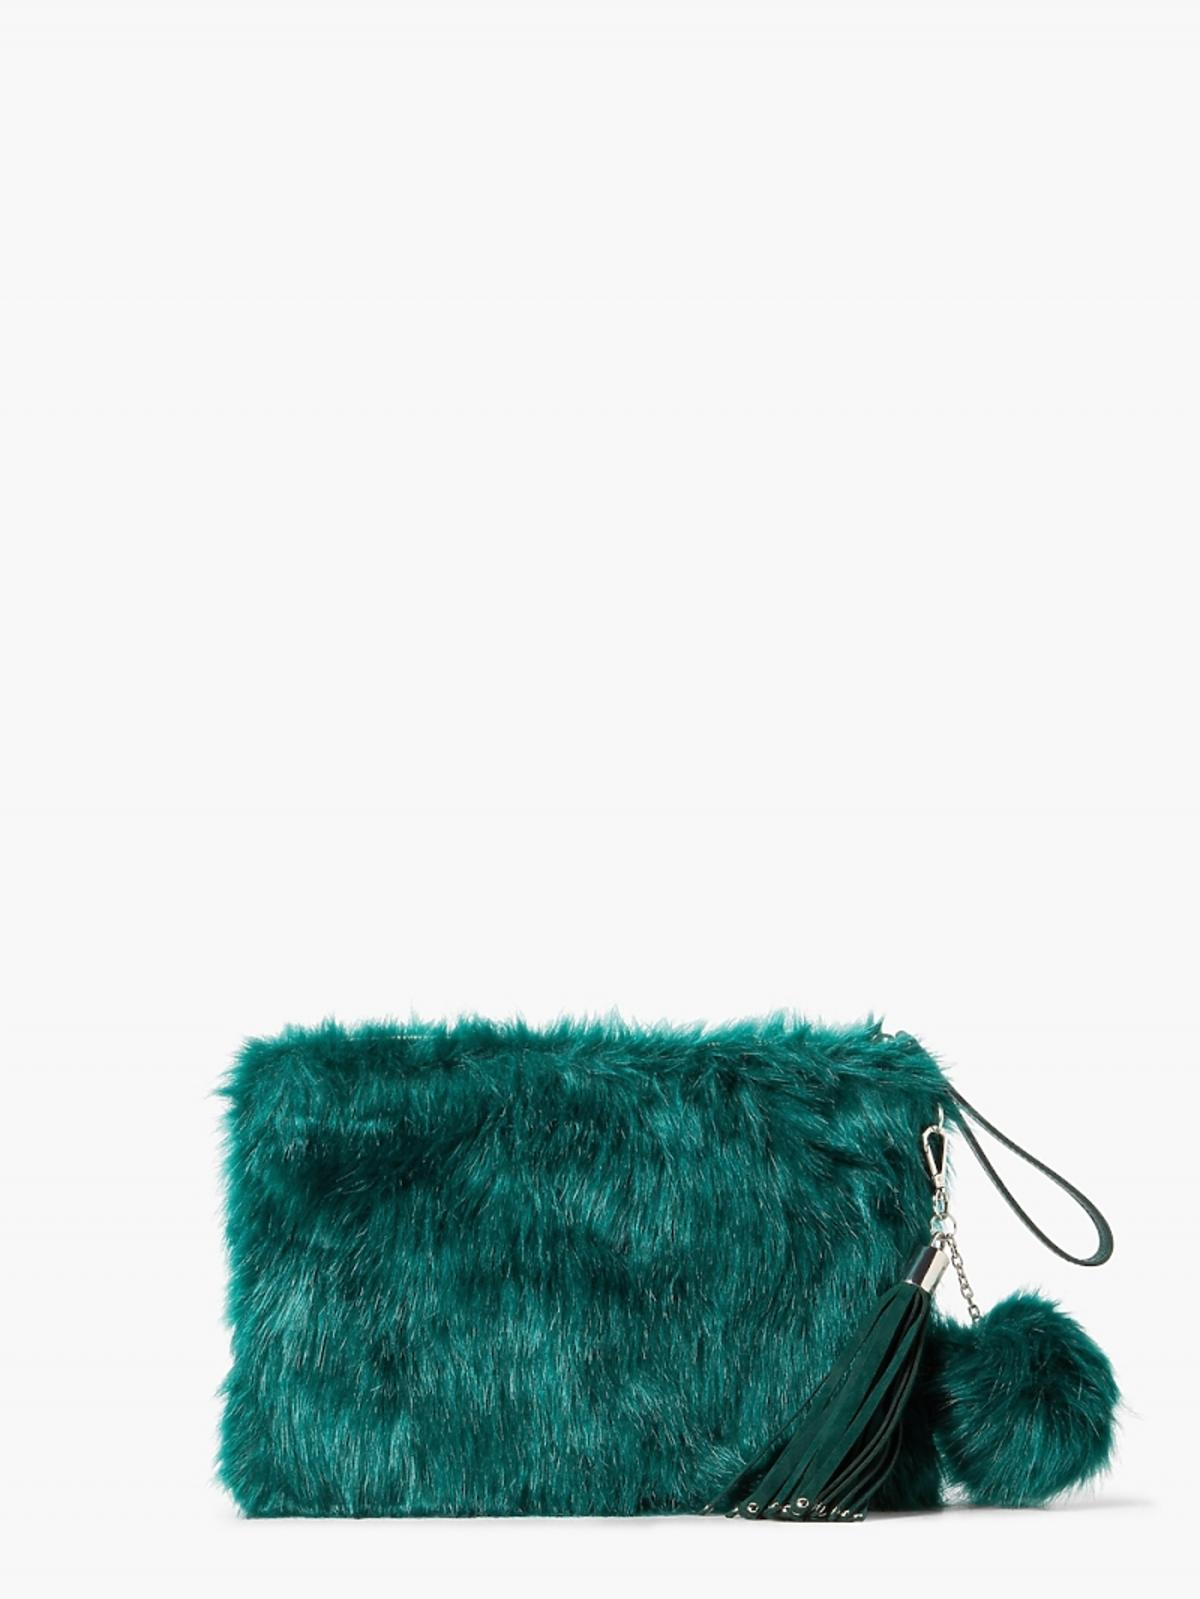 zielona futrzana torebka